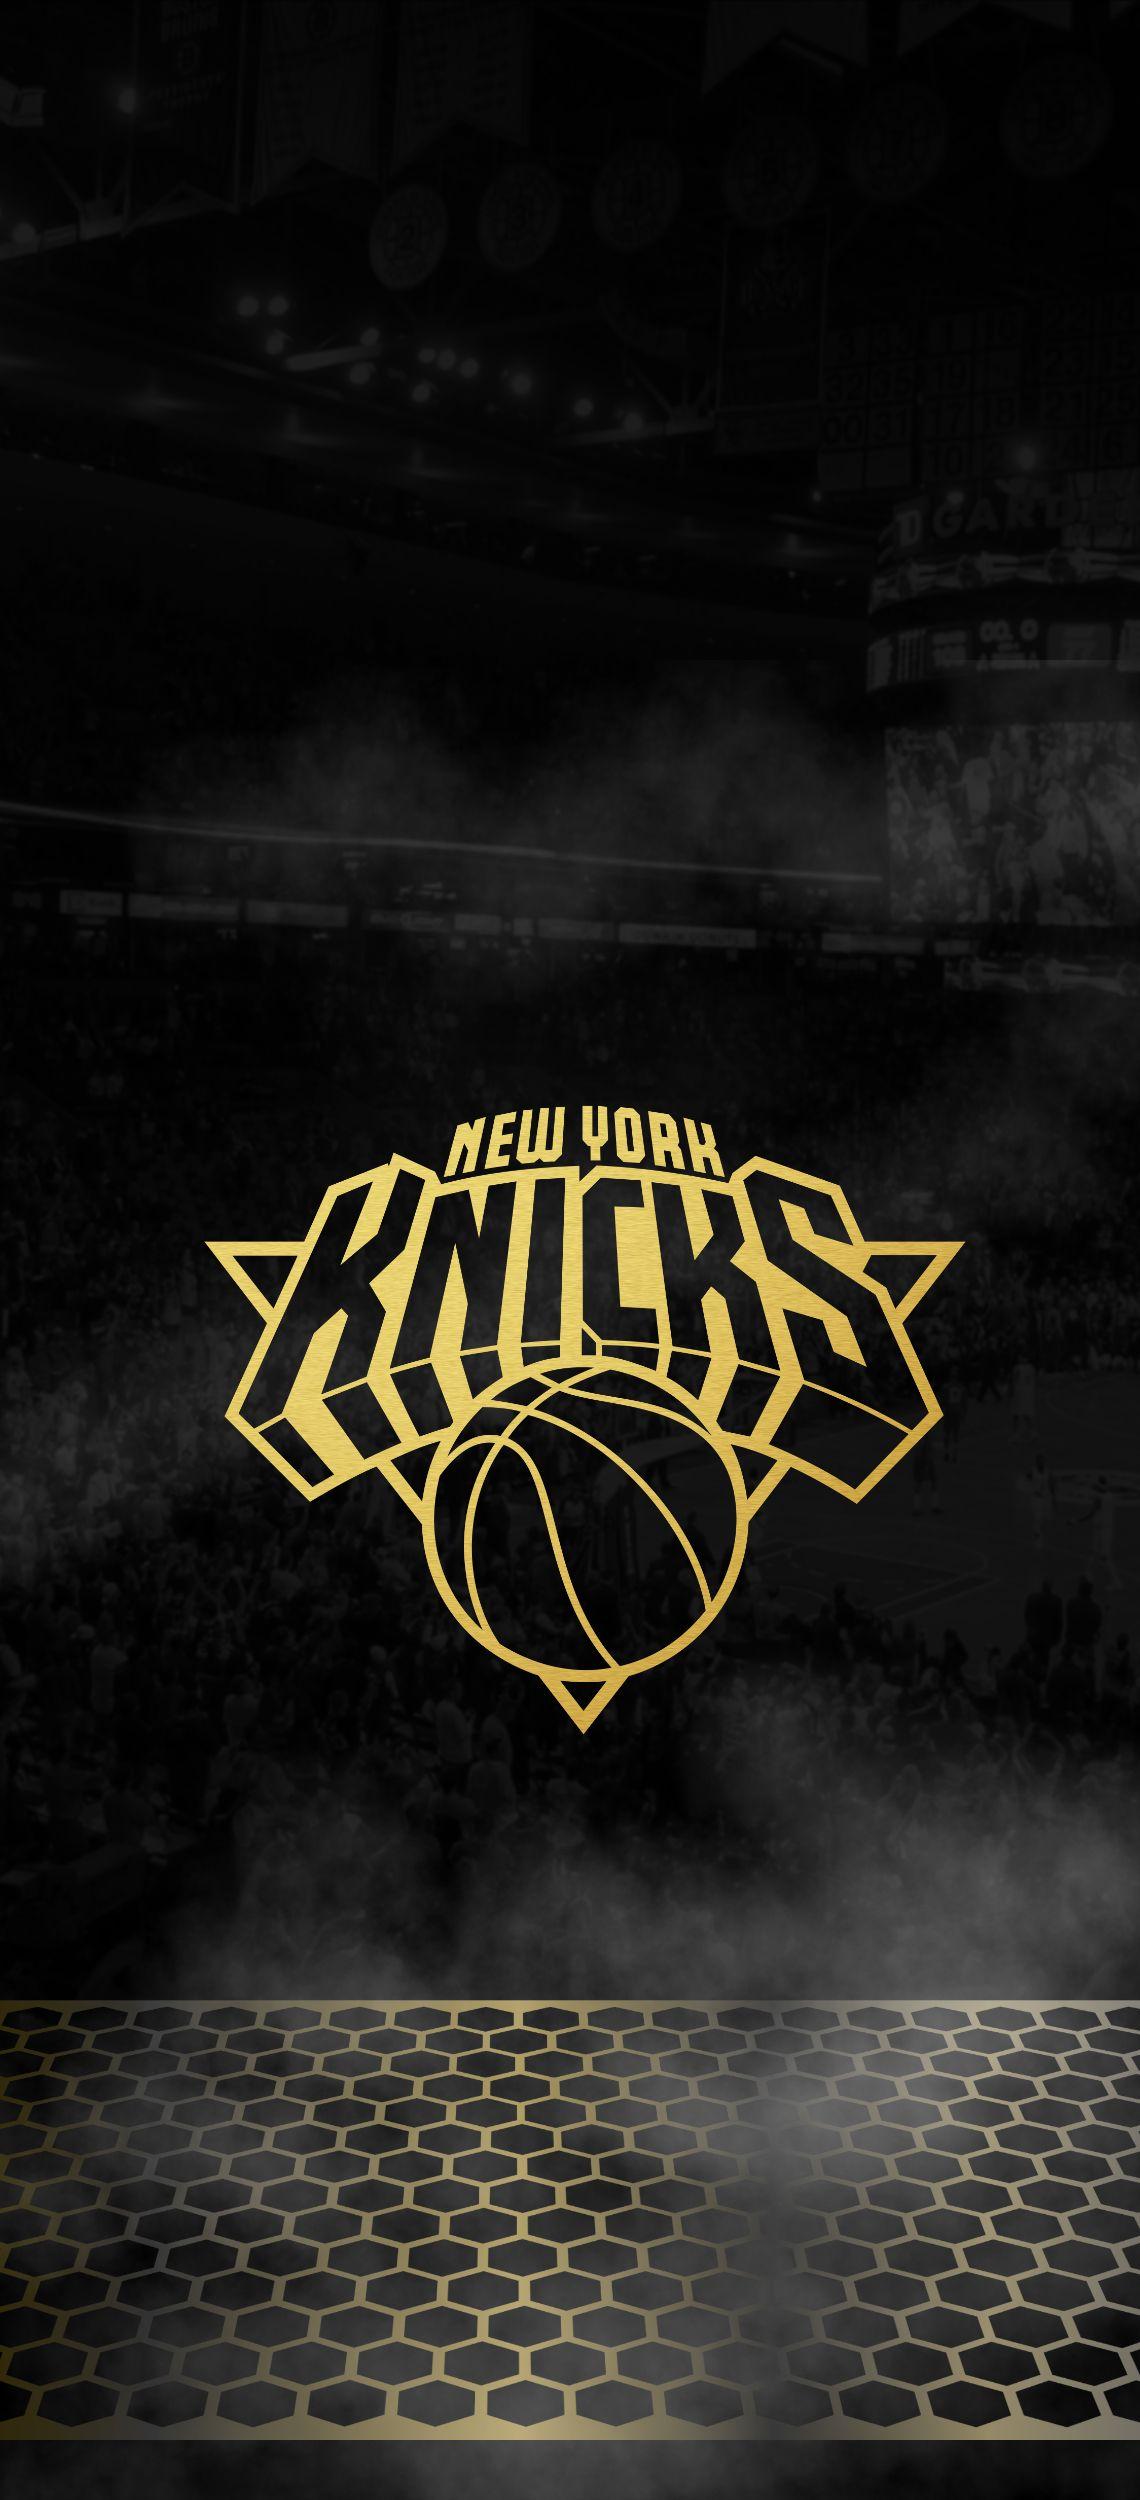 New York Knicks Wallpaper Background New York Knicks Knicks Nba Wallpapers